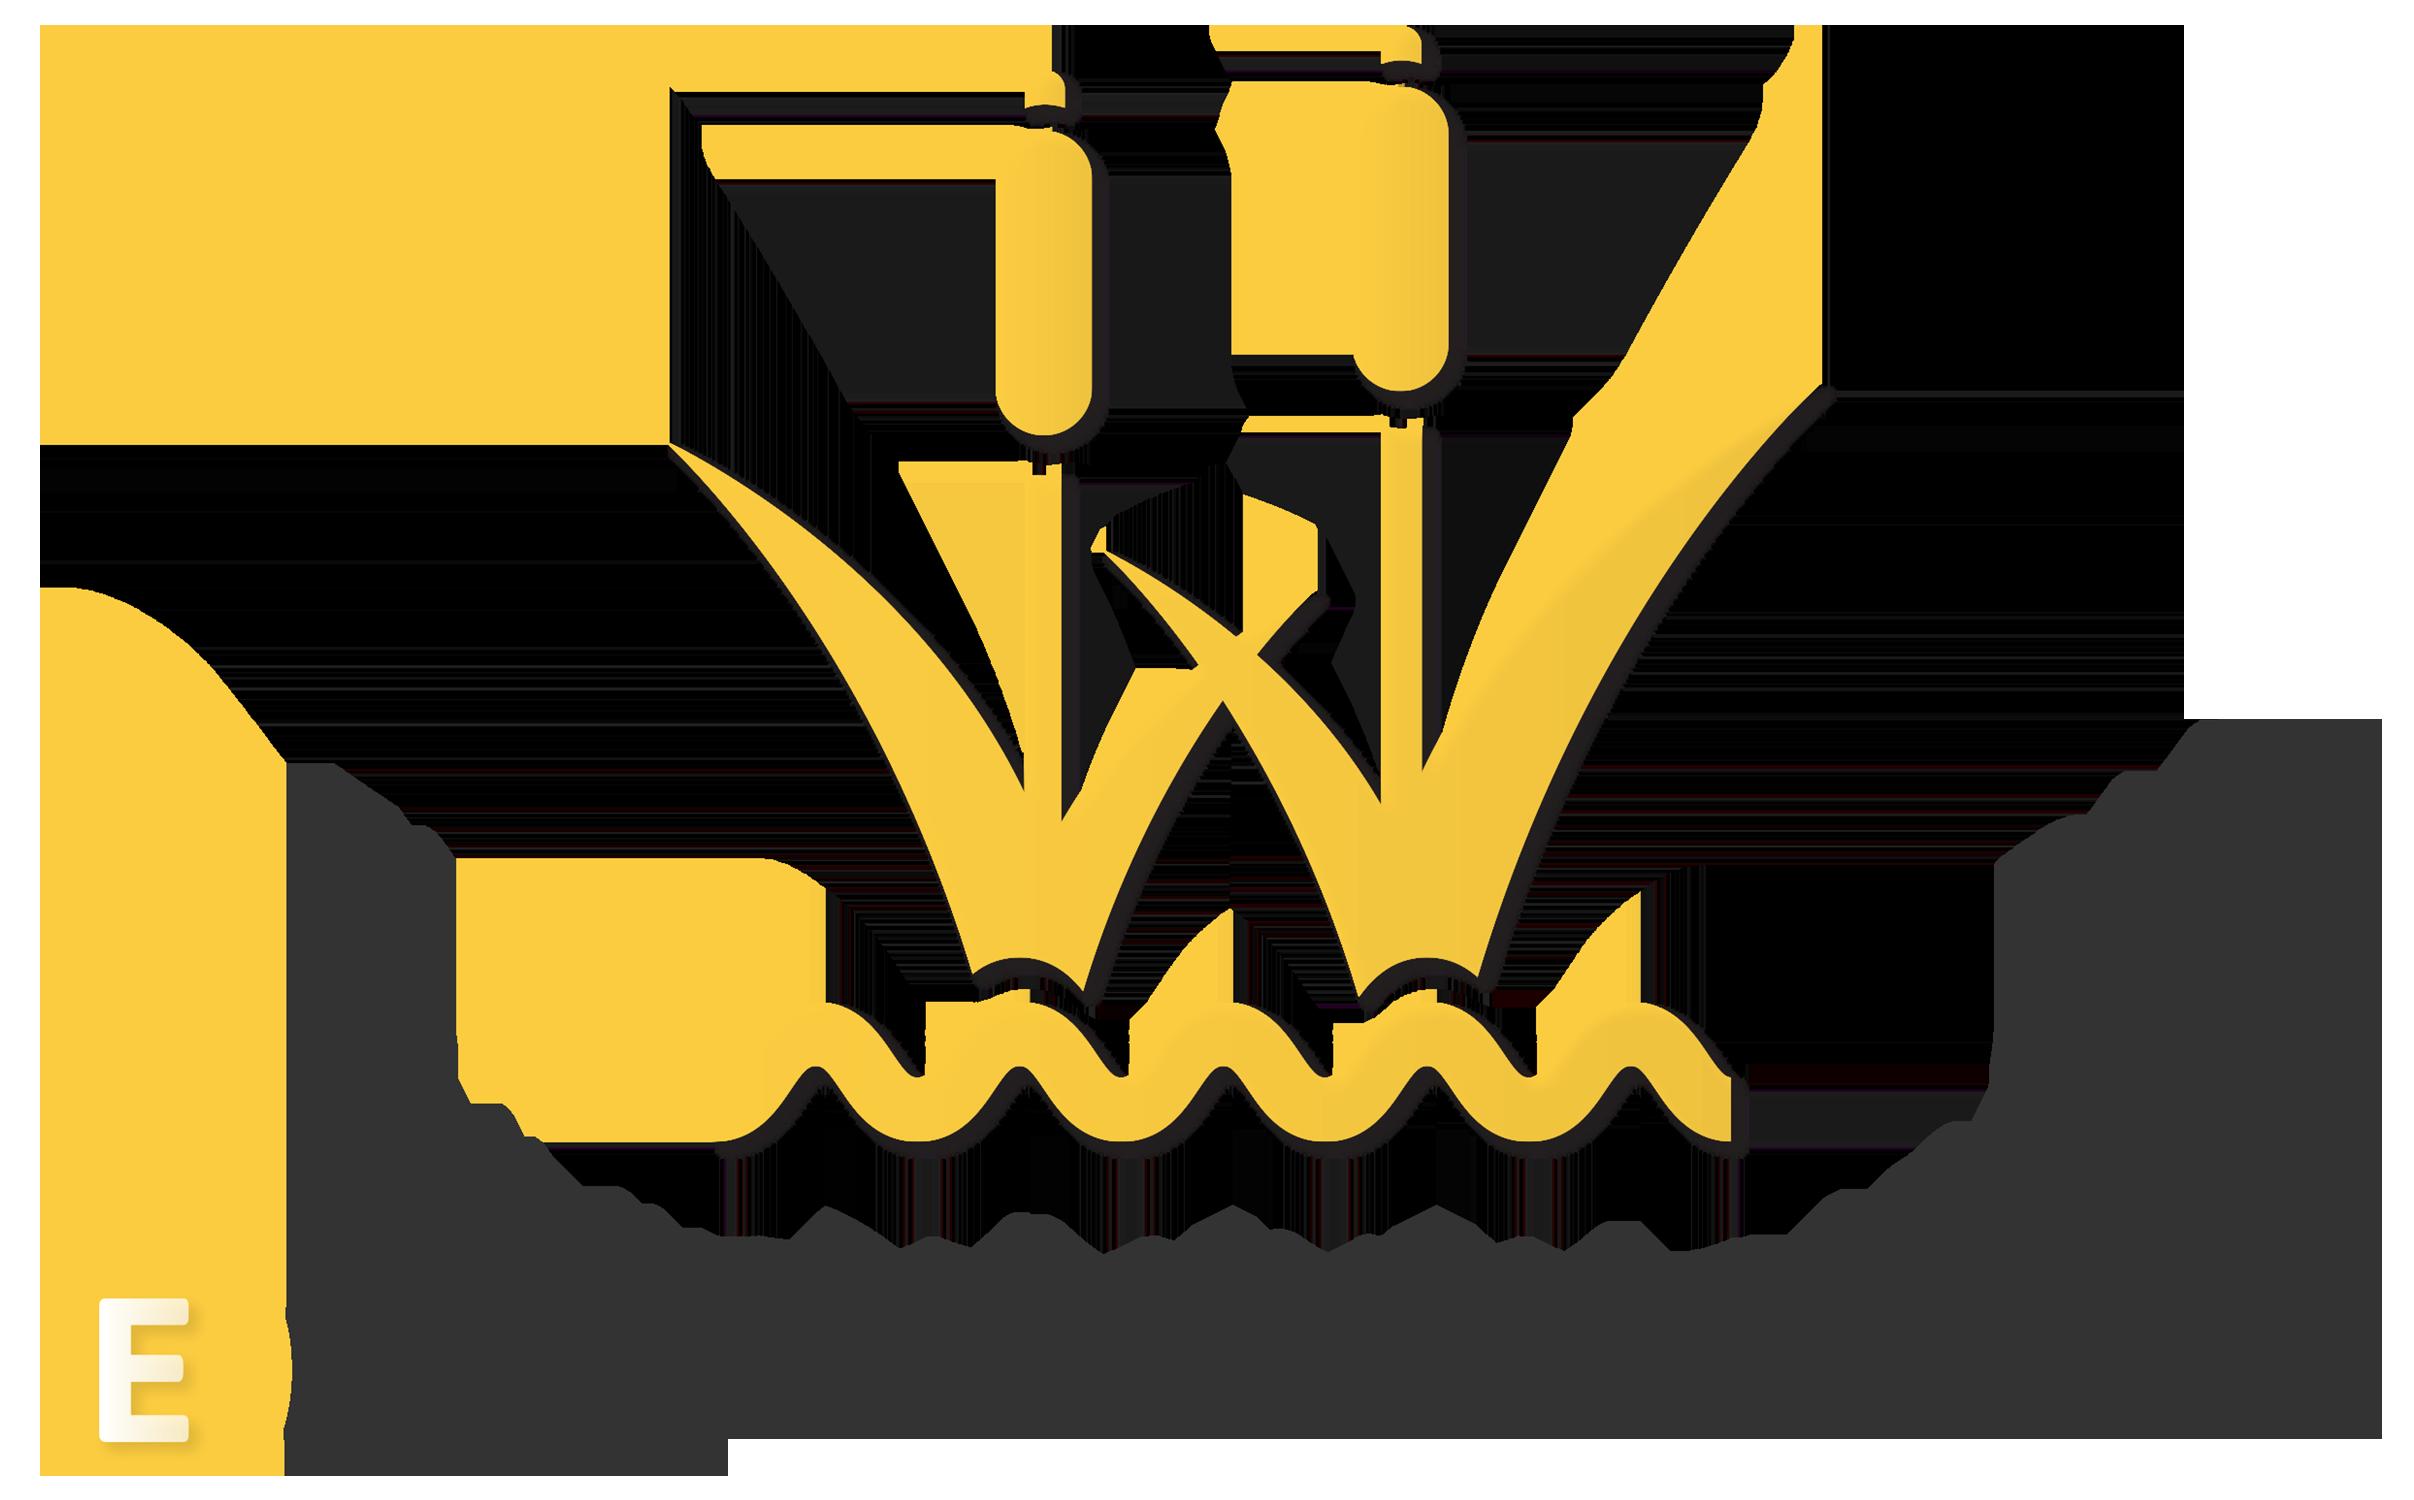 environmental wetland orbital data management analytics web app pipeline